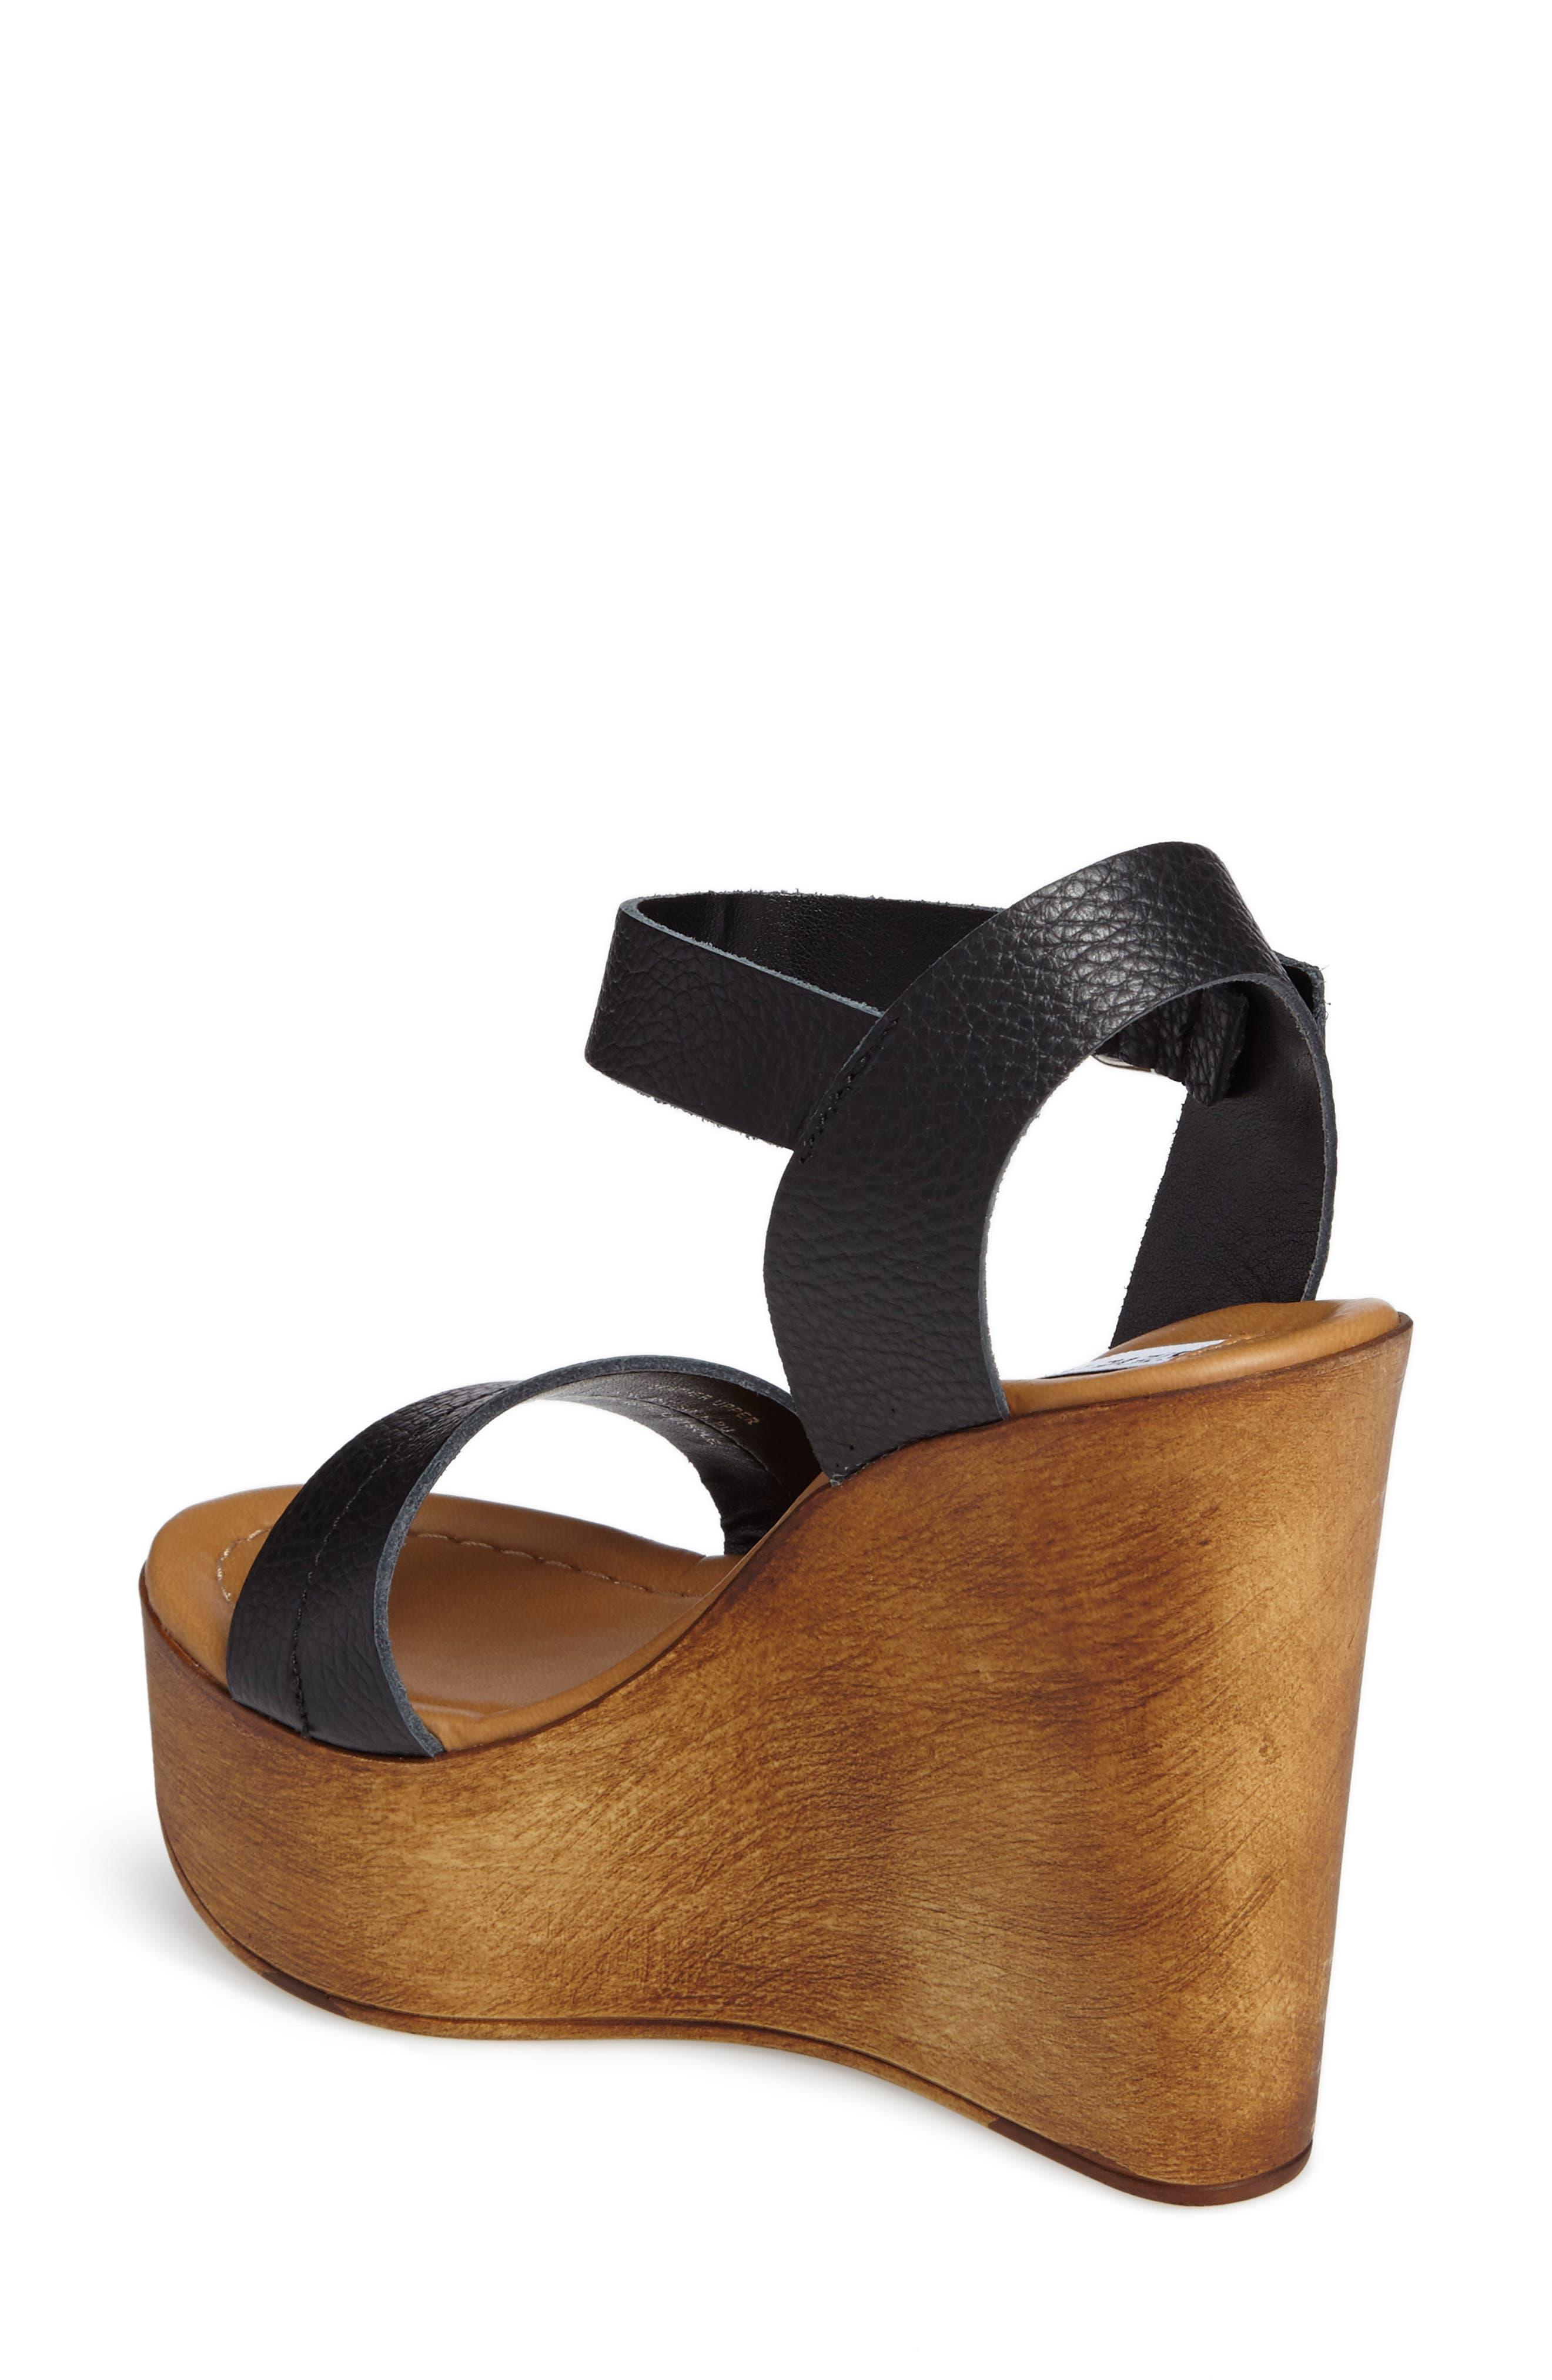 Belma Wedge Sandal,                             Alternate thumbnail 2, color,                             Black Leather